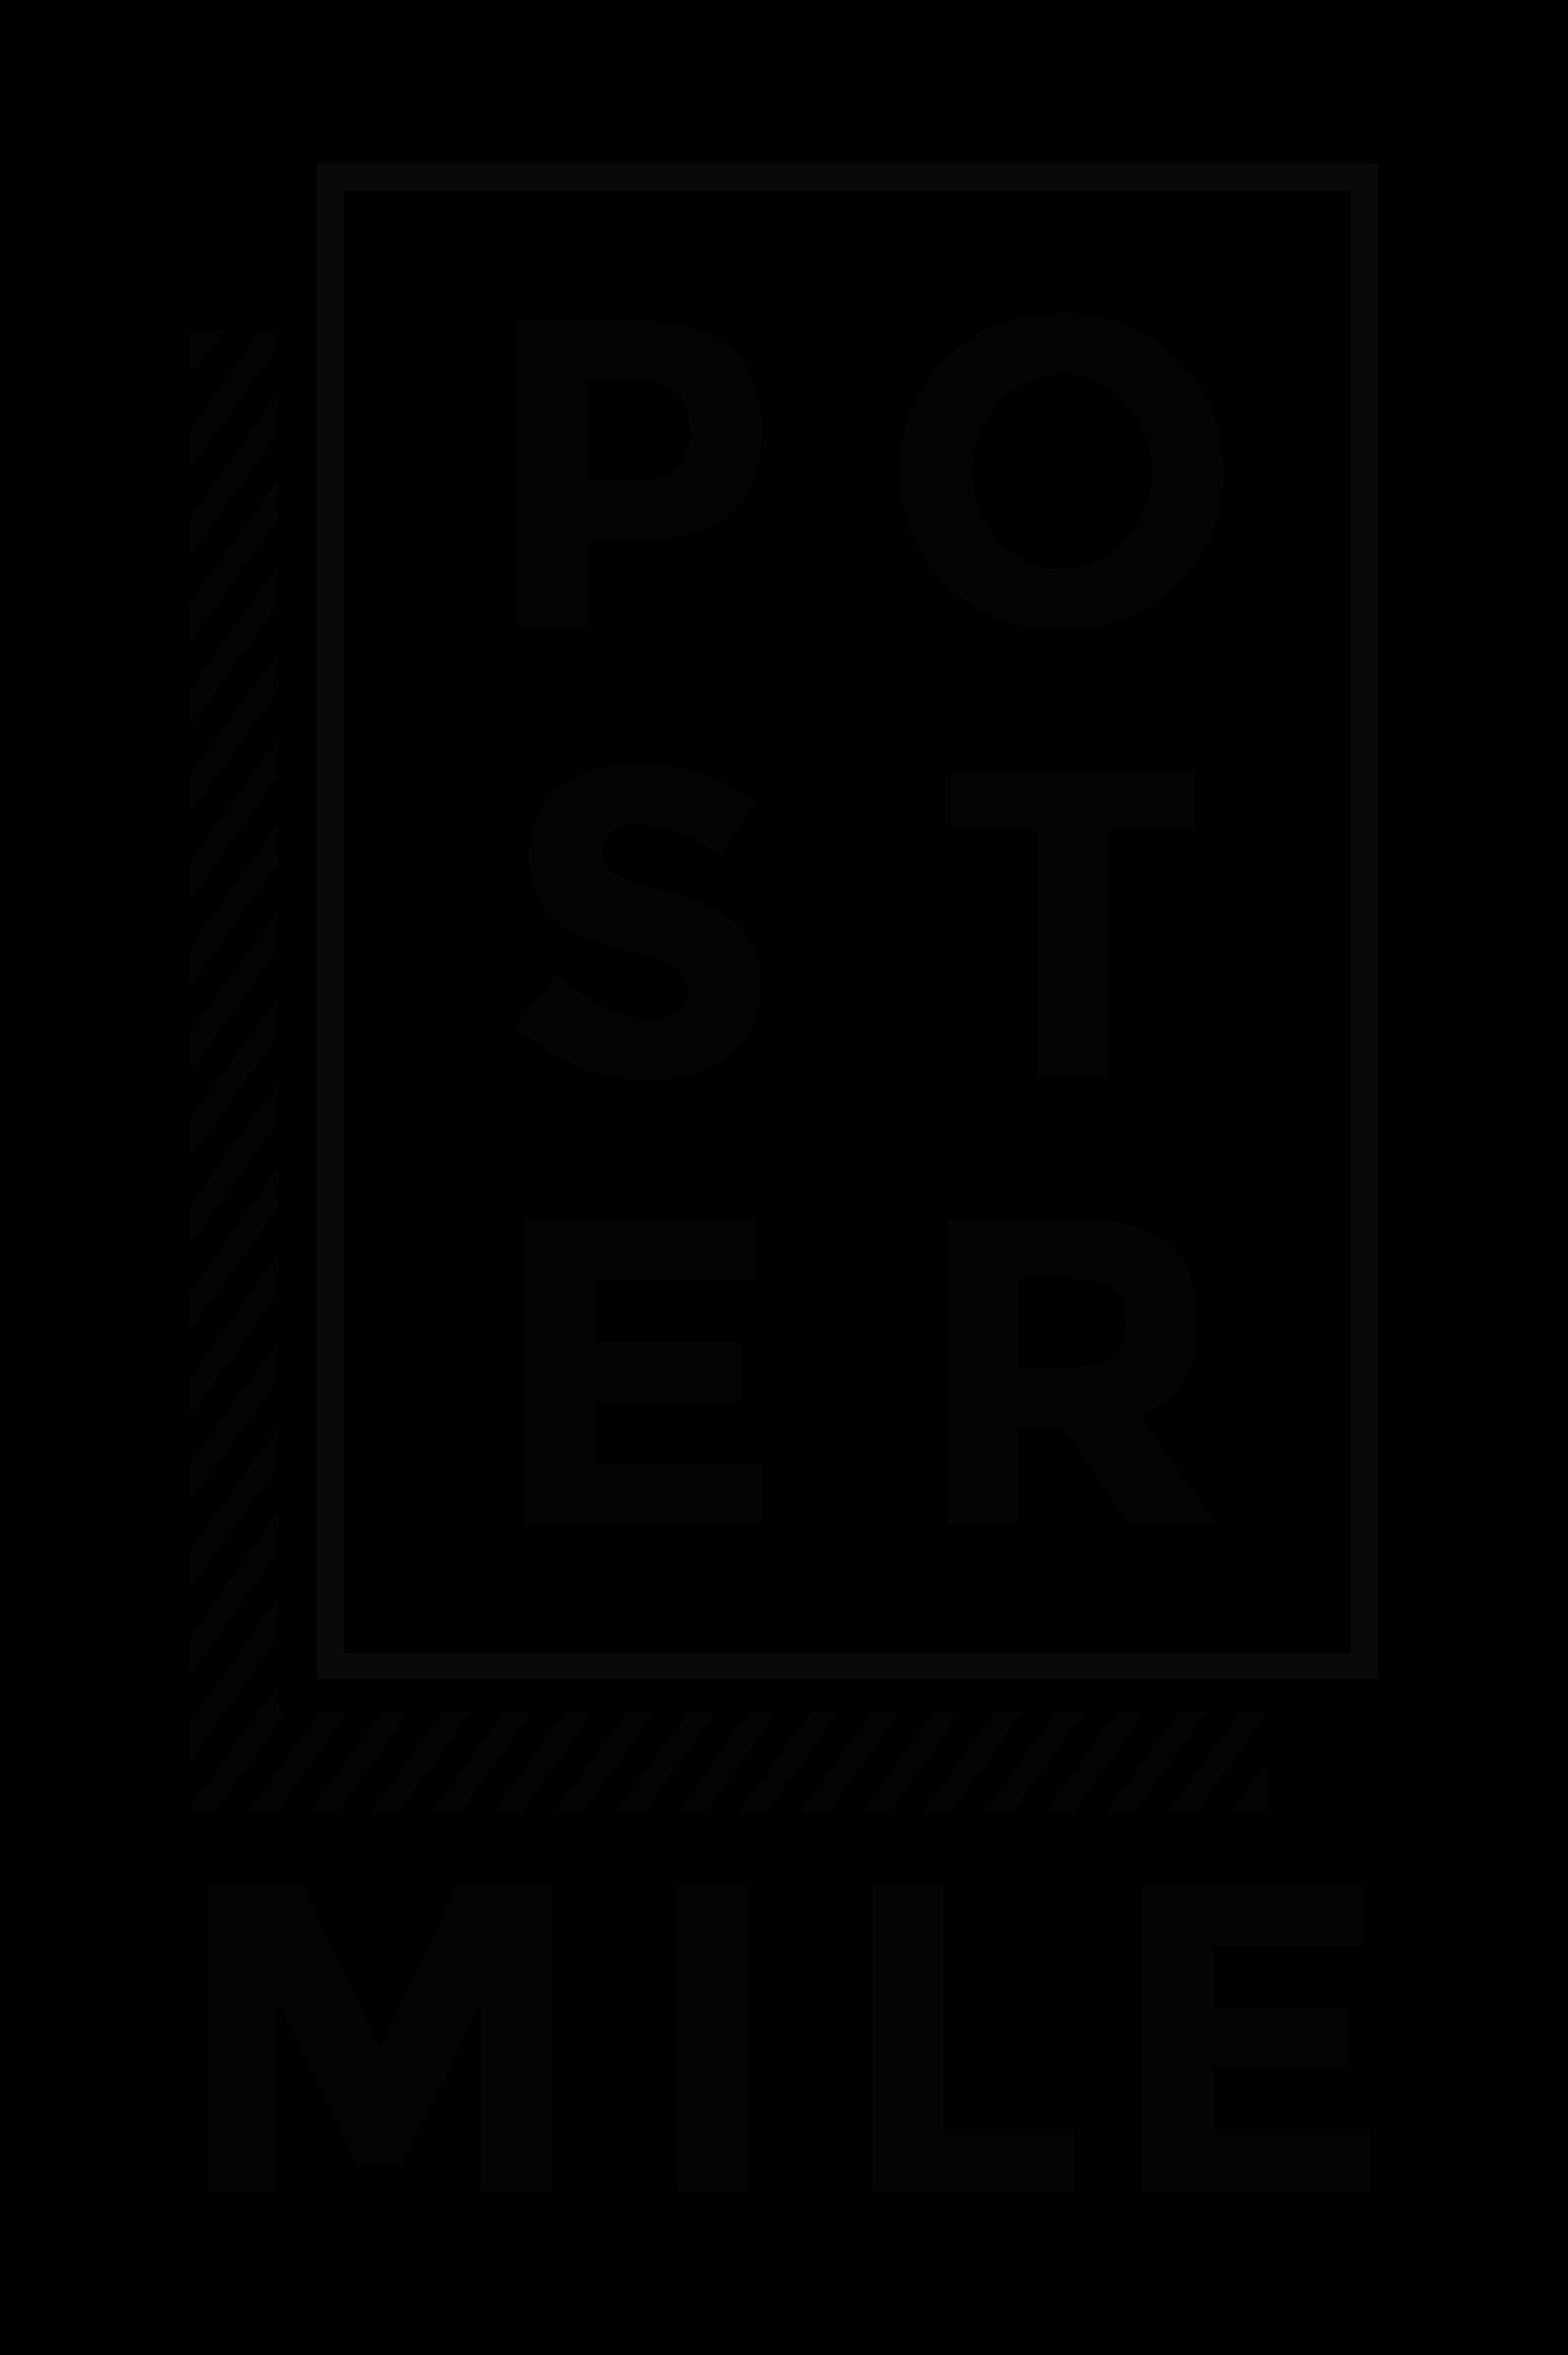 POSTERMILE_PRIMARYLOGOMARK_BLACK_RGB-01.png